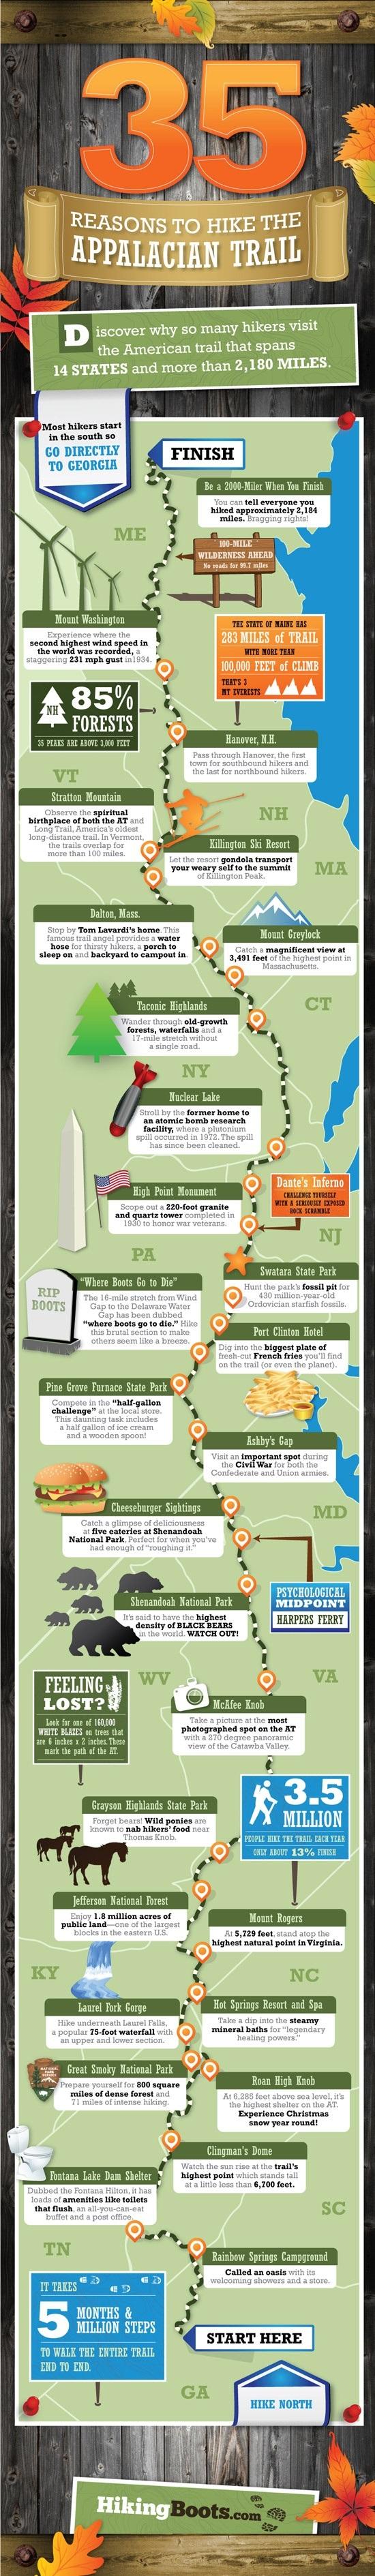 35 Reasons to Hike Appalachian Trail